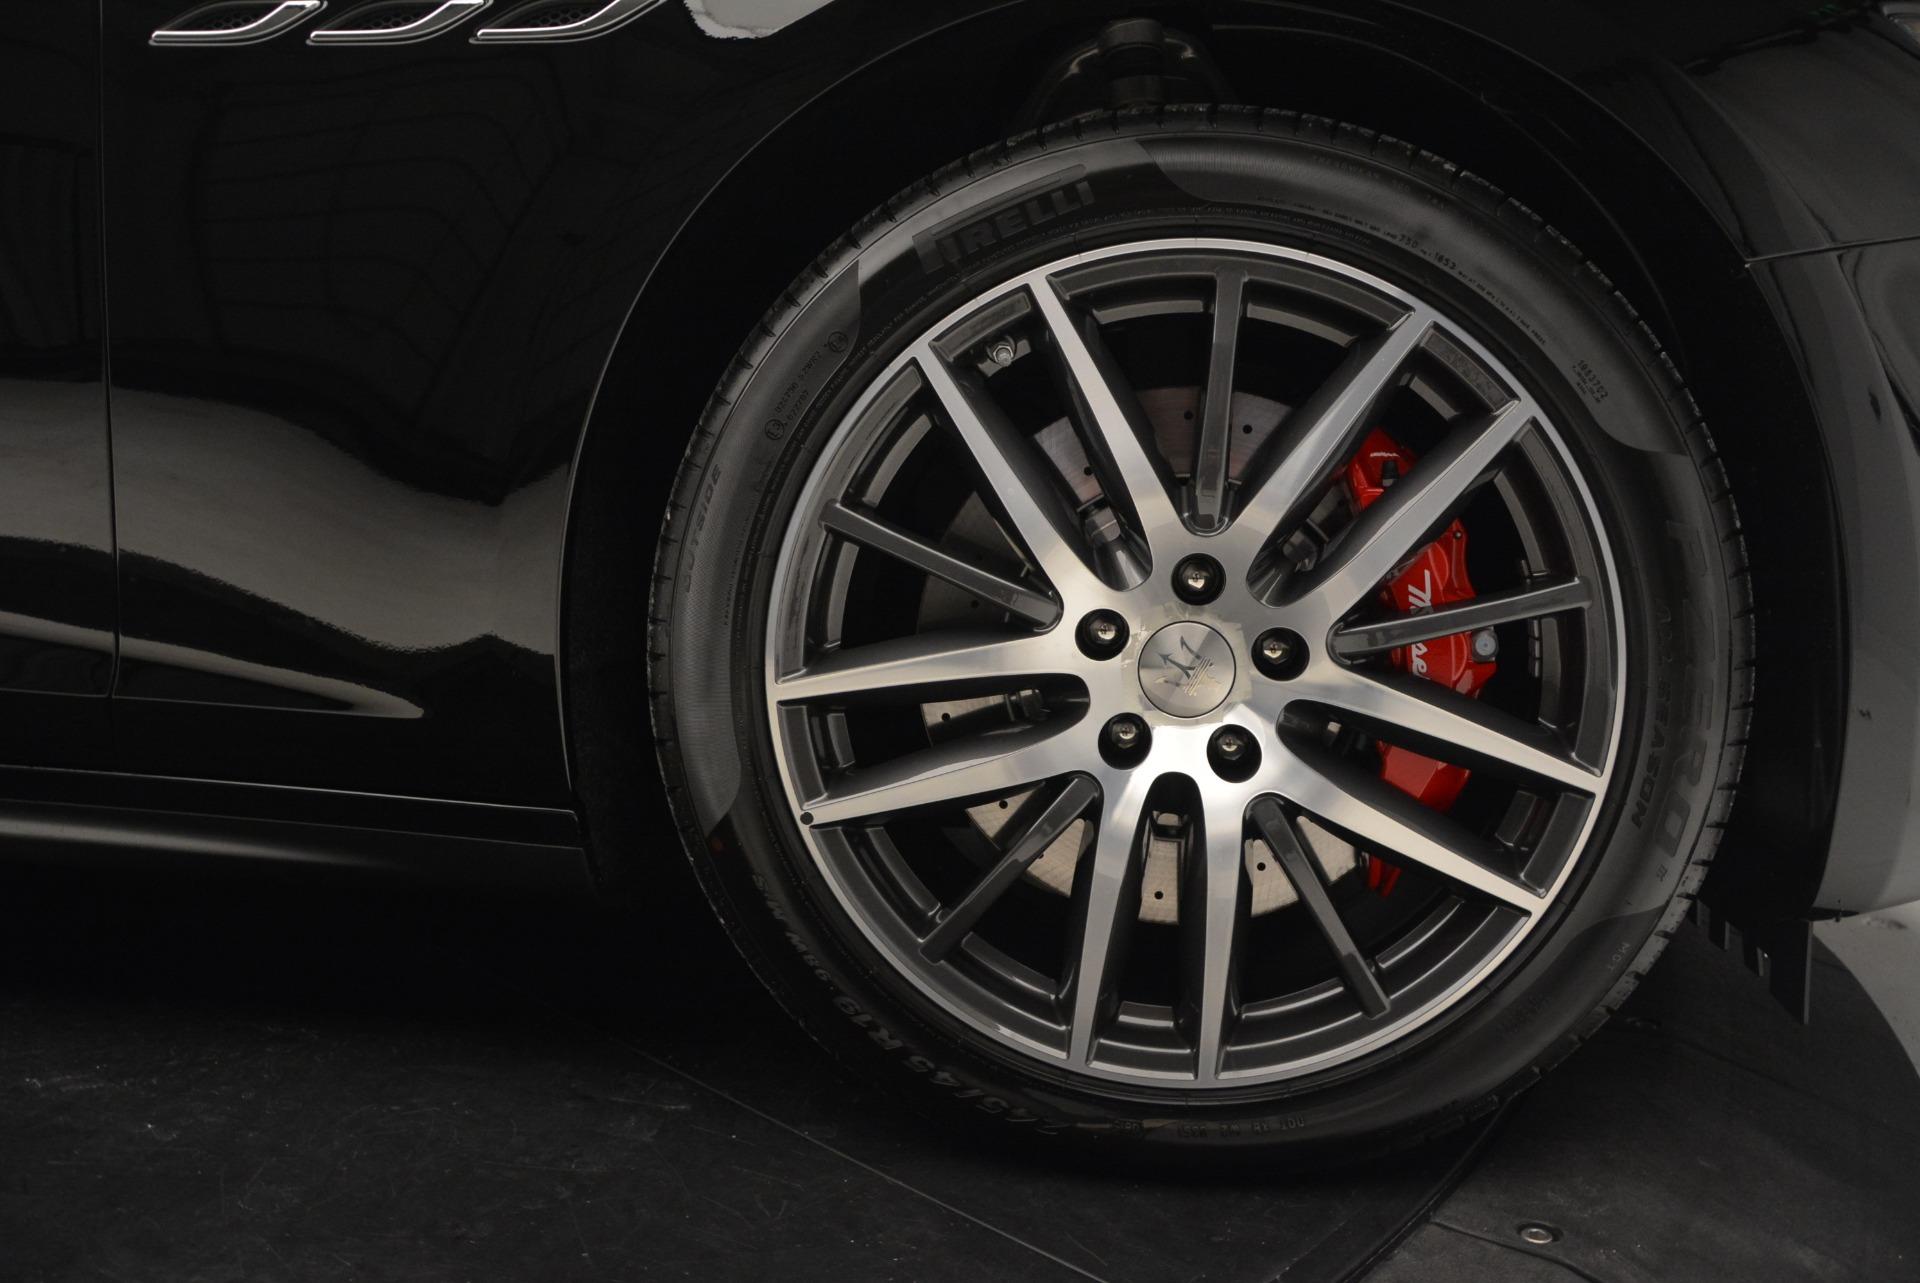 Used 2017 Maserati Ghibli S Q4 - EX Loaner For Sale In Greenwich, CT 576_p11